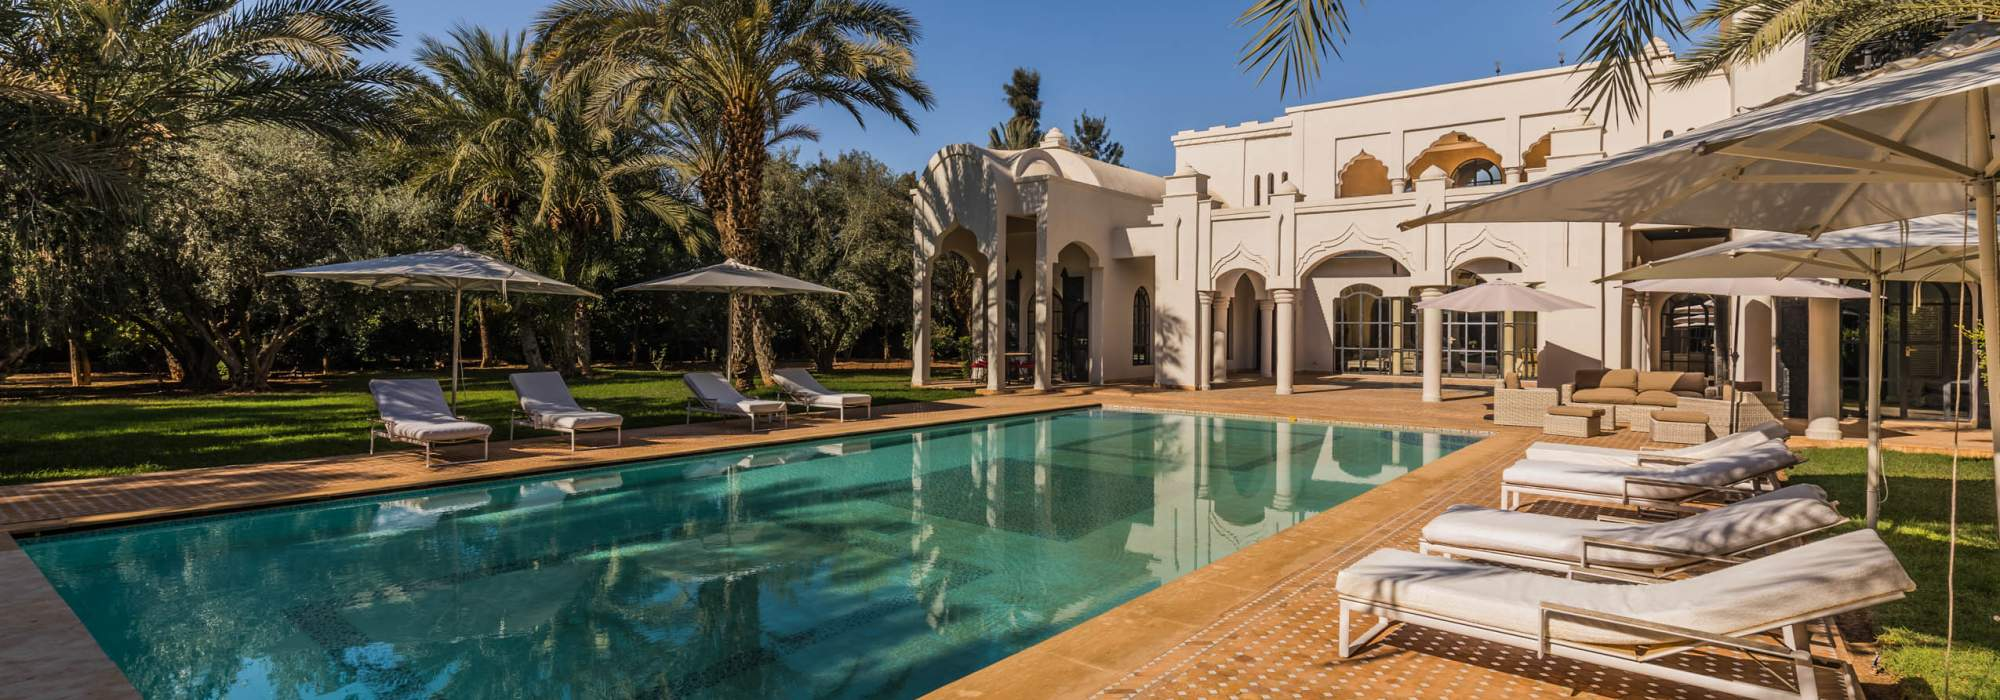 Palais Arabo-Andalous a vendre golf marrakech